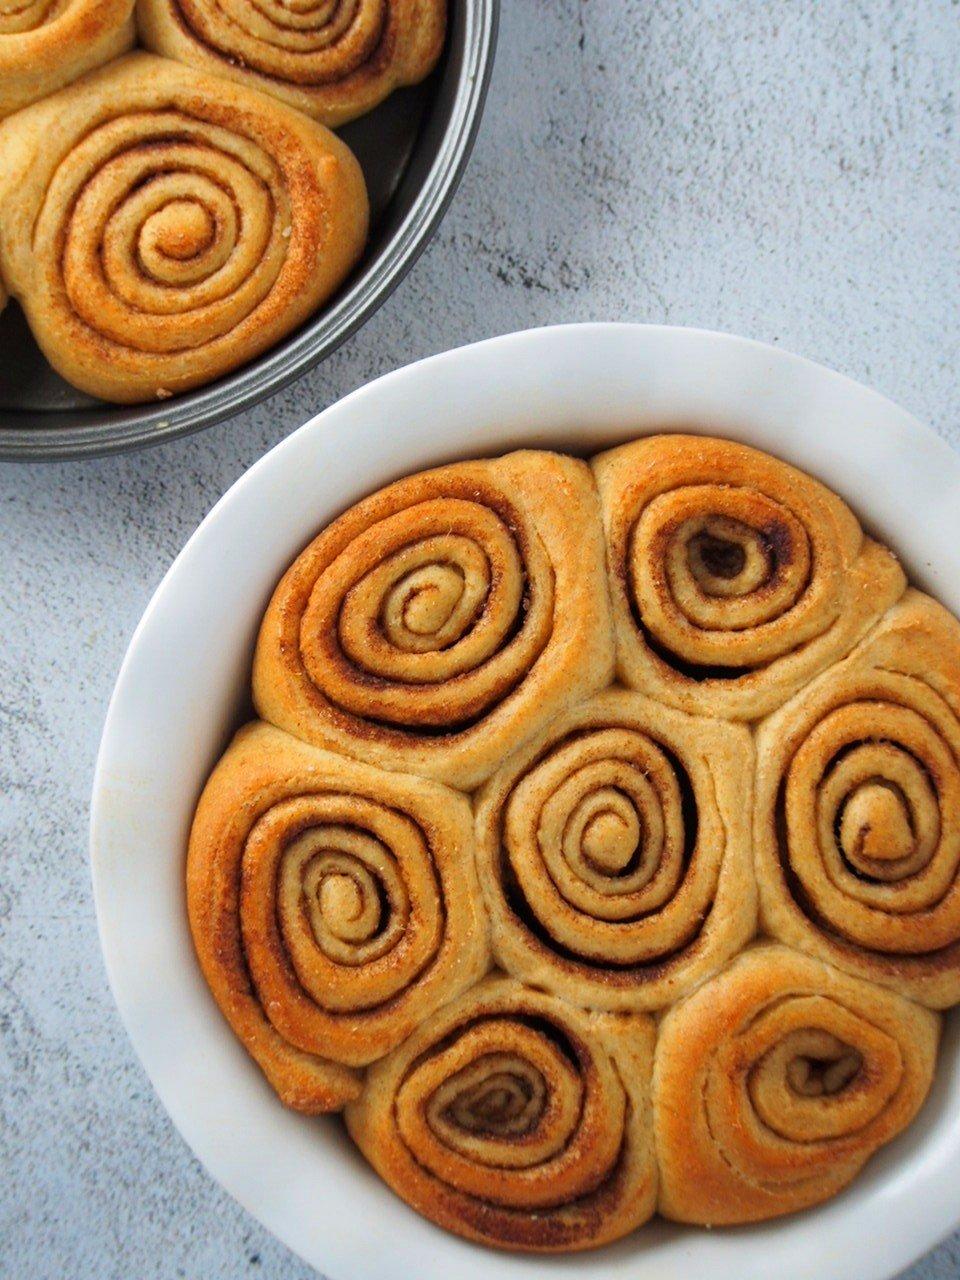 Freshly baked Whole wheat cinnamon rolls ready for the caramel glaze.